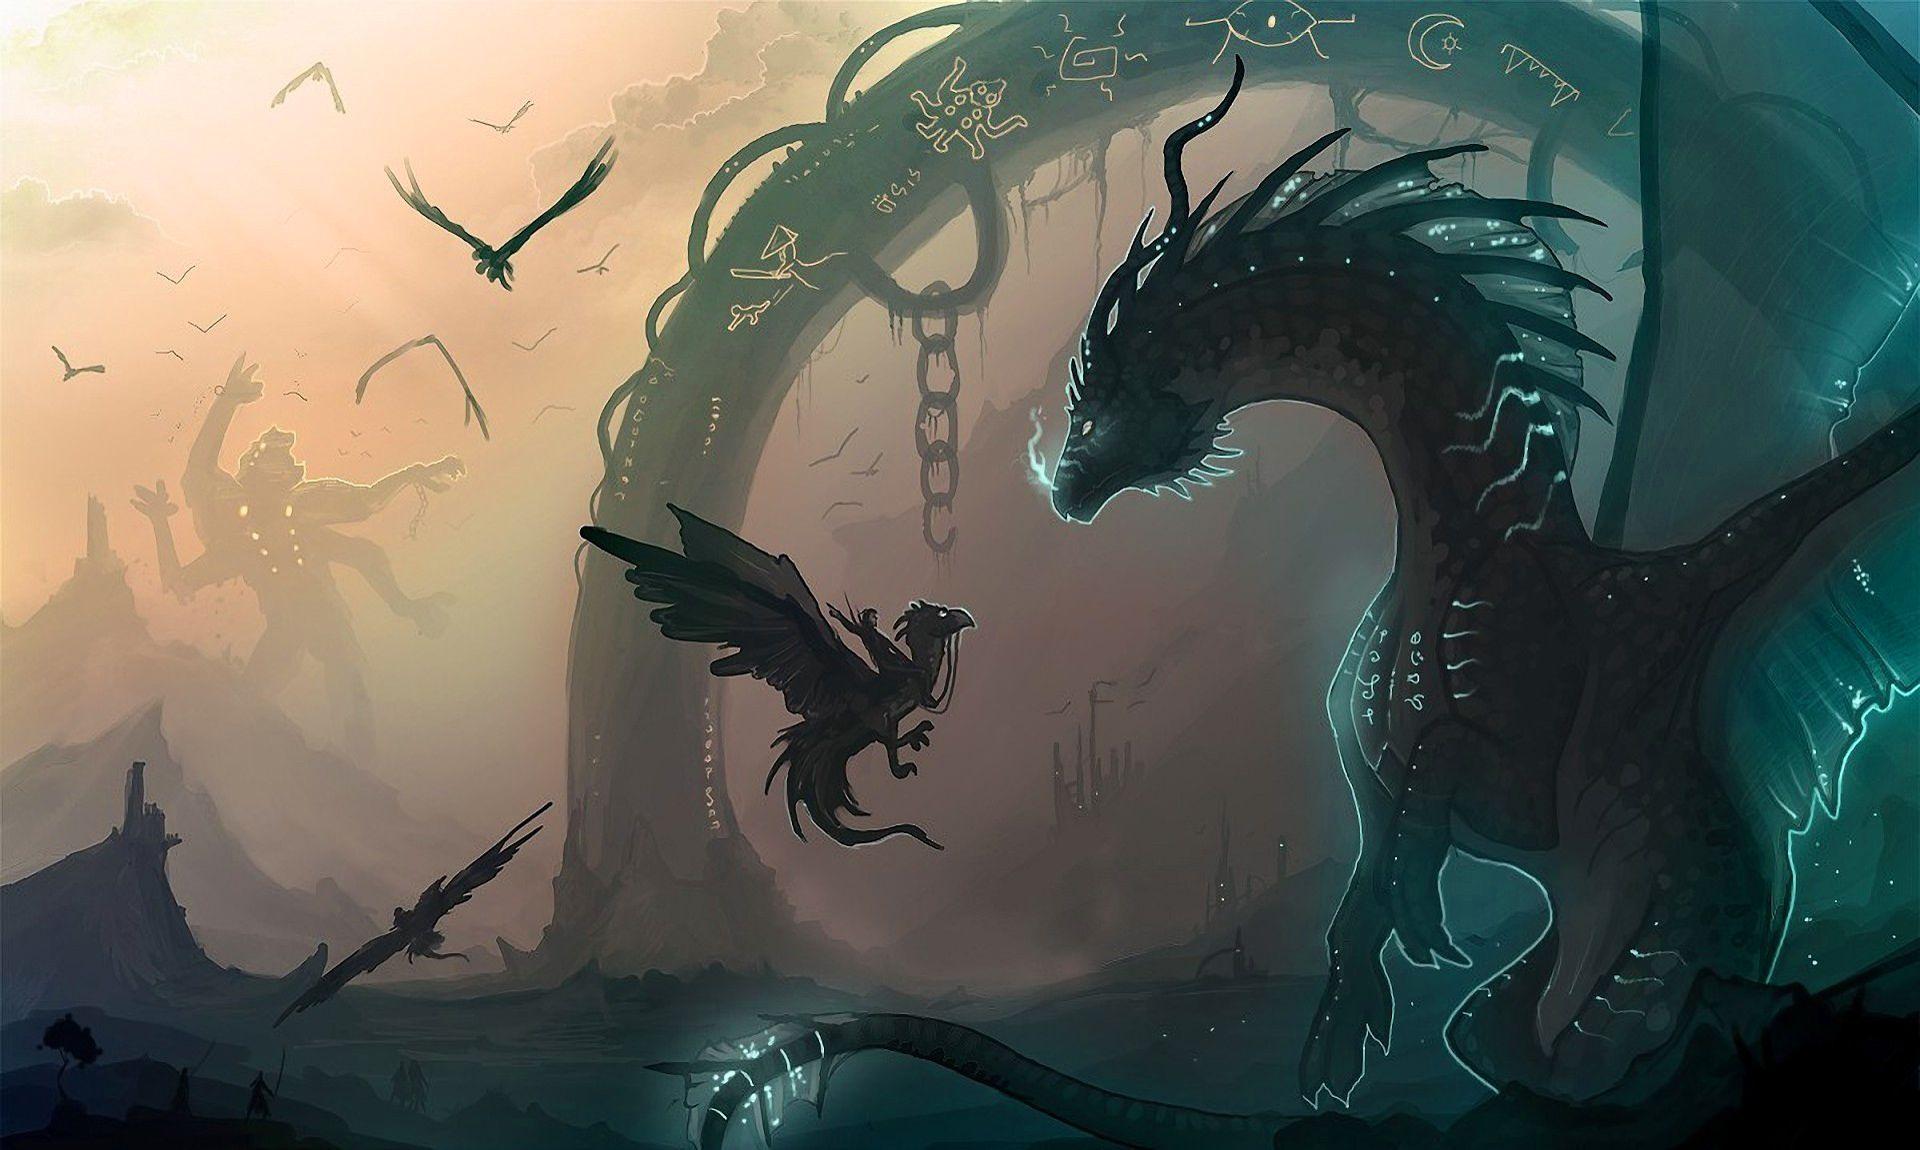 Epic Dragon Wallpaper Dump With Images Monster Artwork Dragon